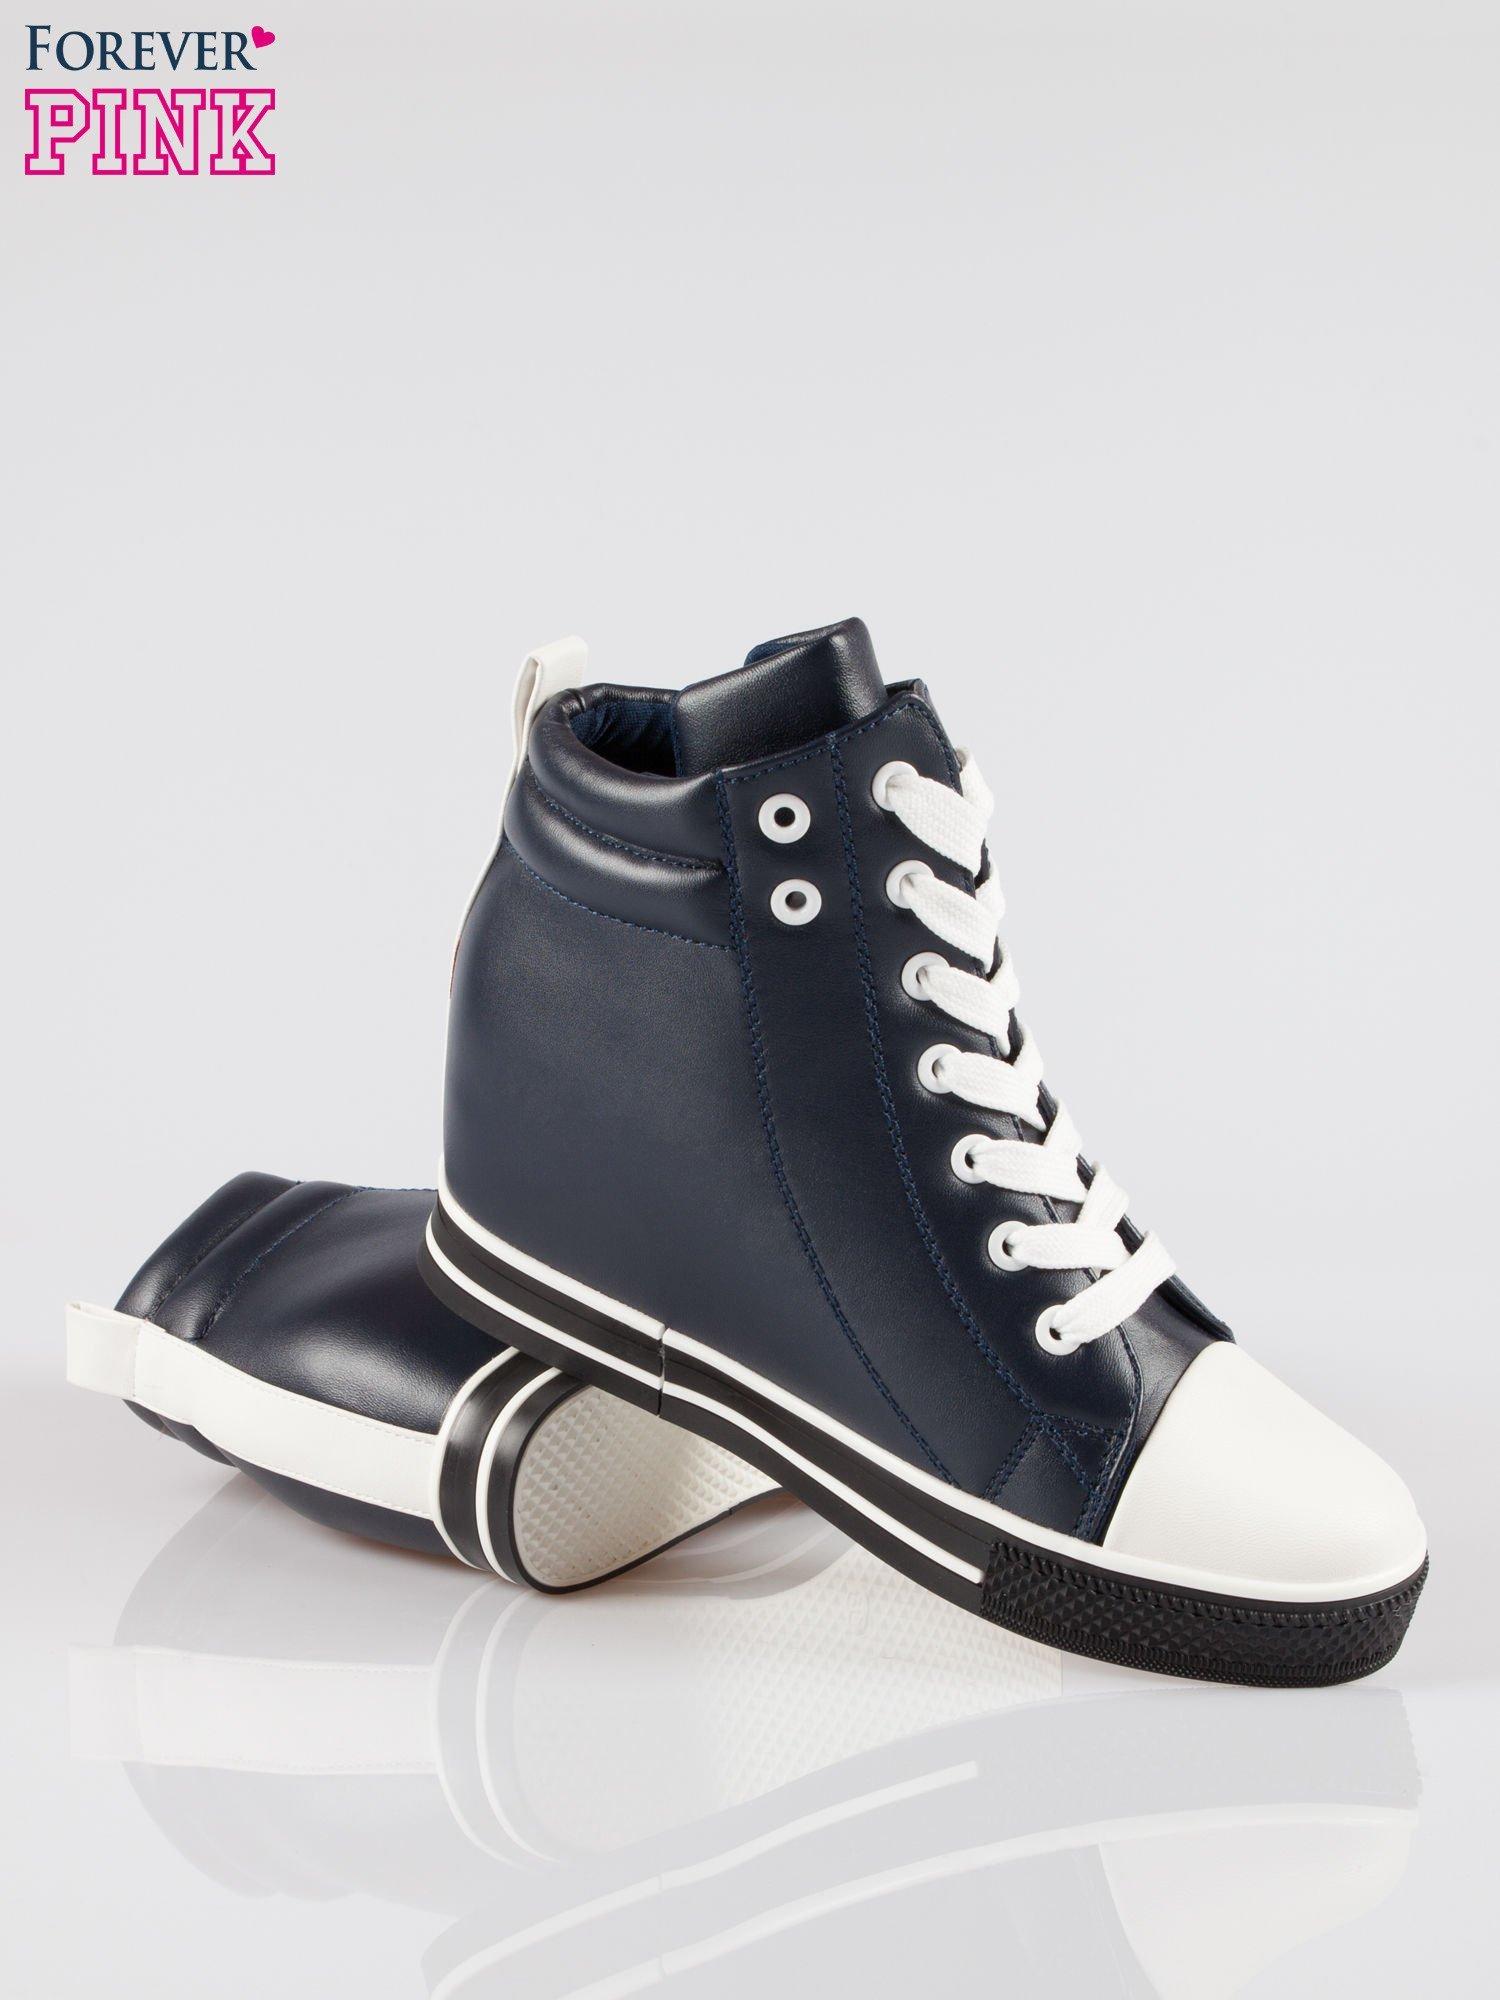 Cienoniebieskie sneakersy trampki cap toe na koturnie                                  zdj.                                  4